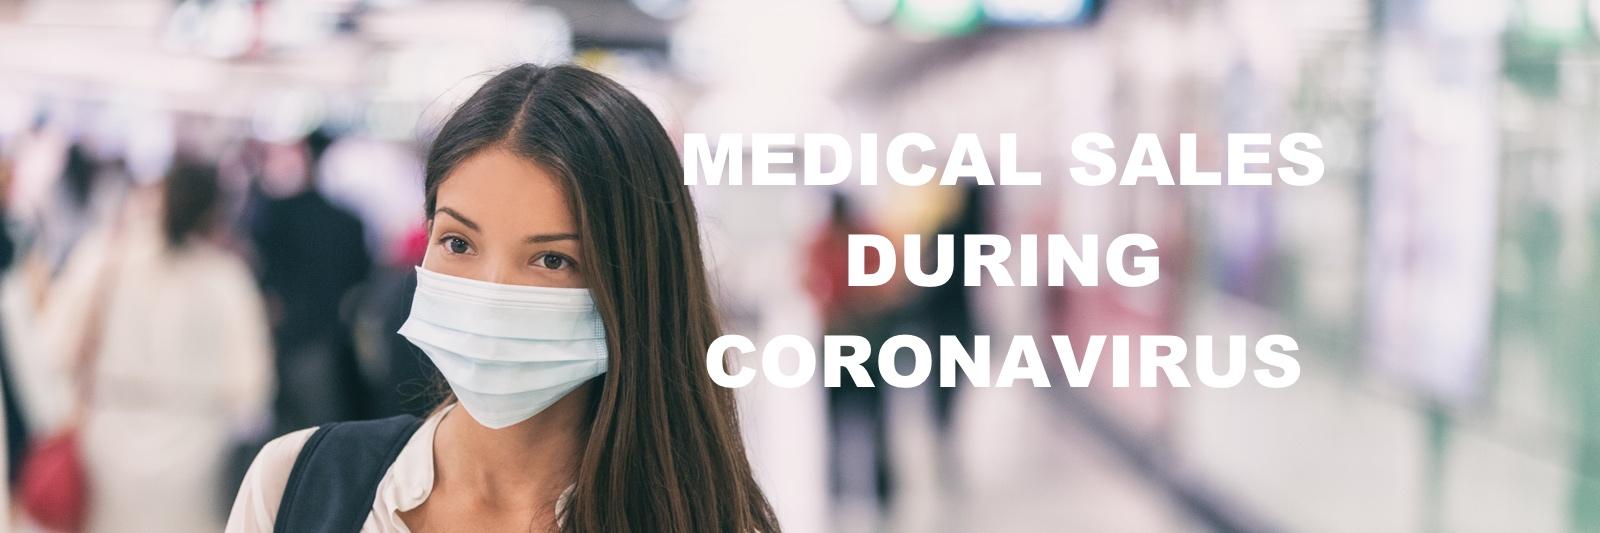 Medical sales during coronavirus